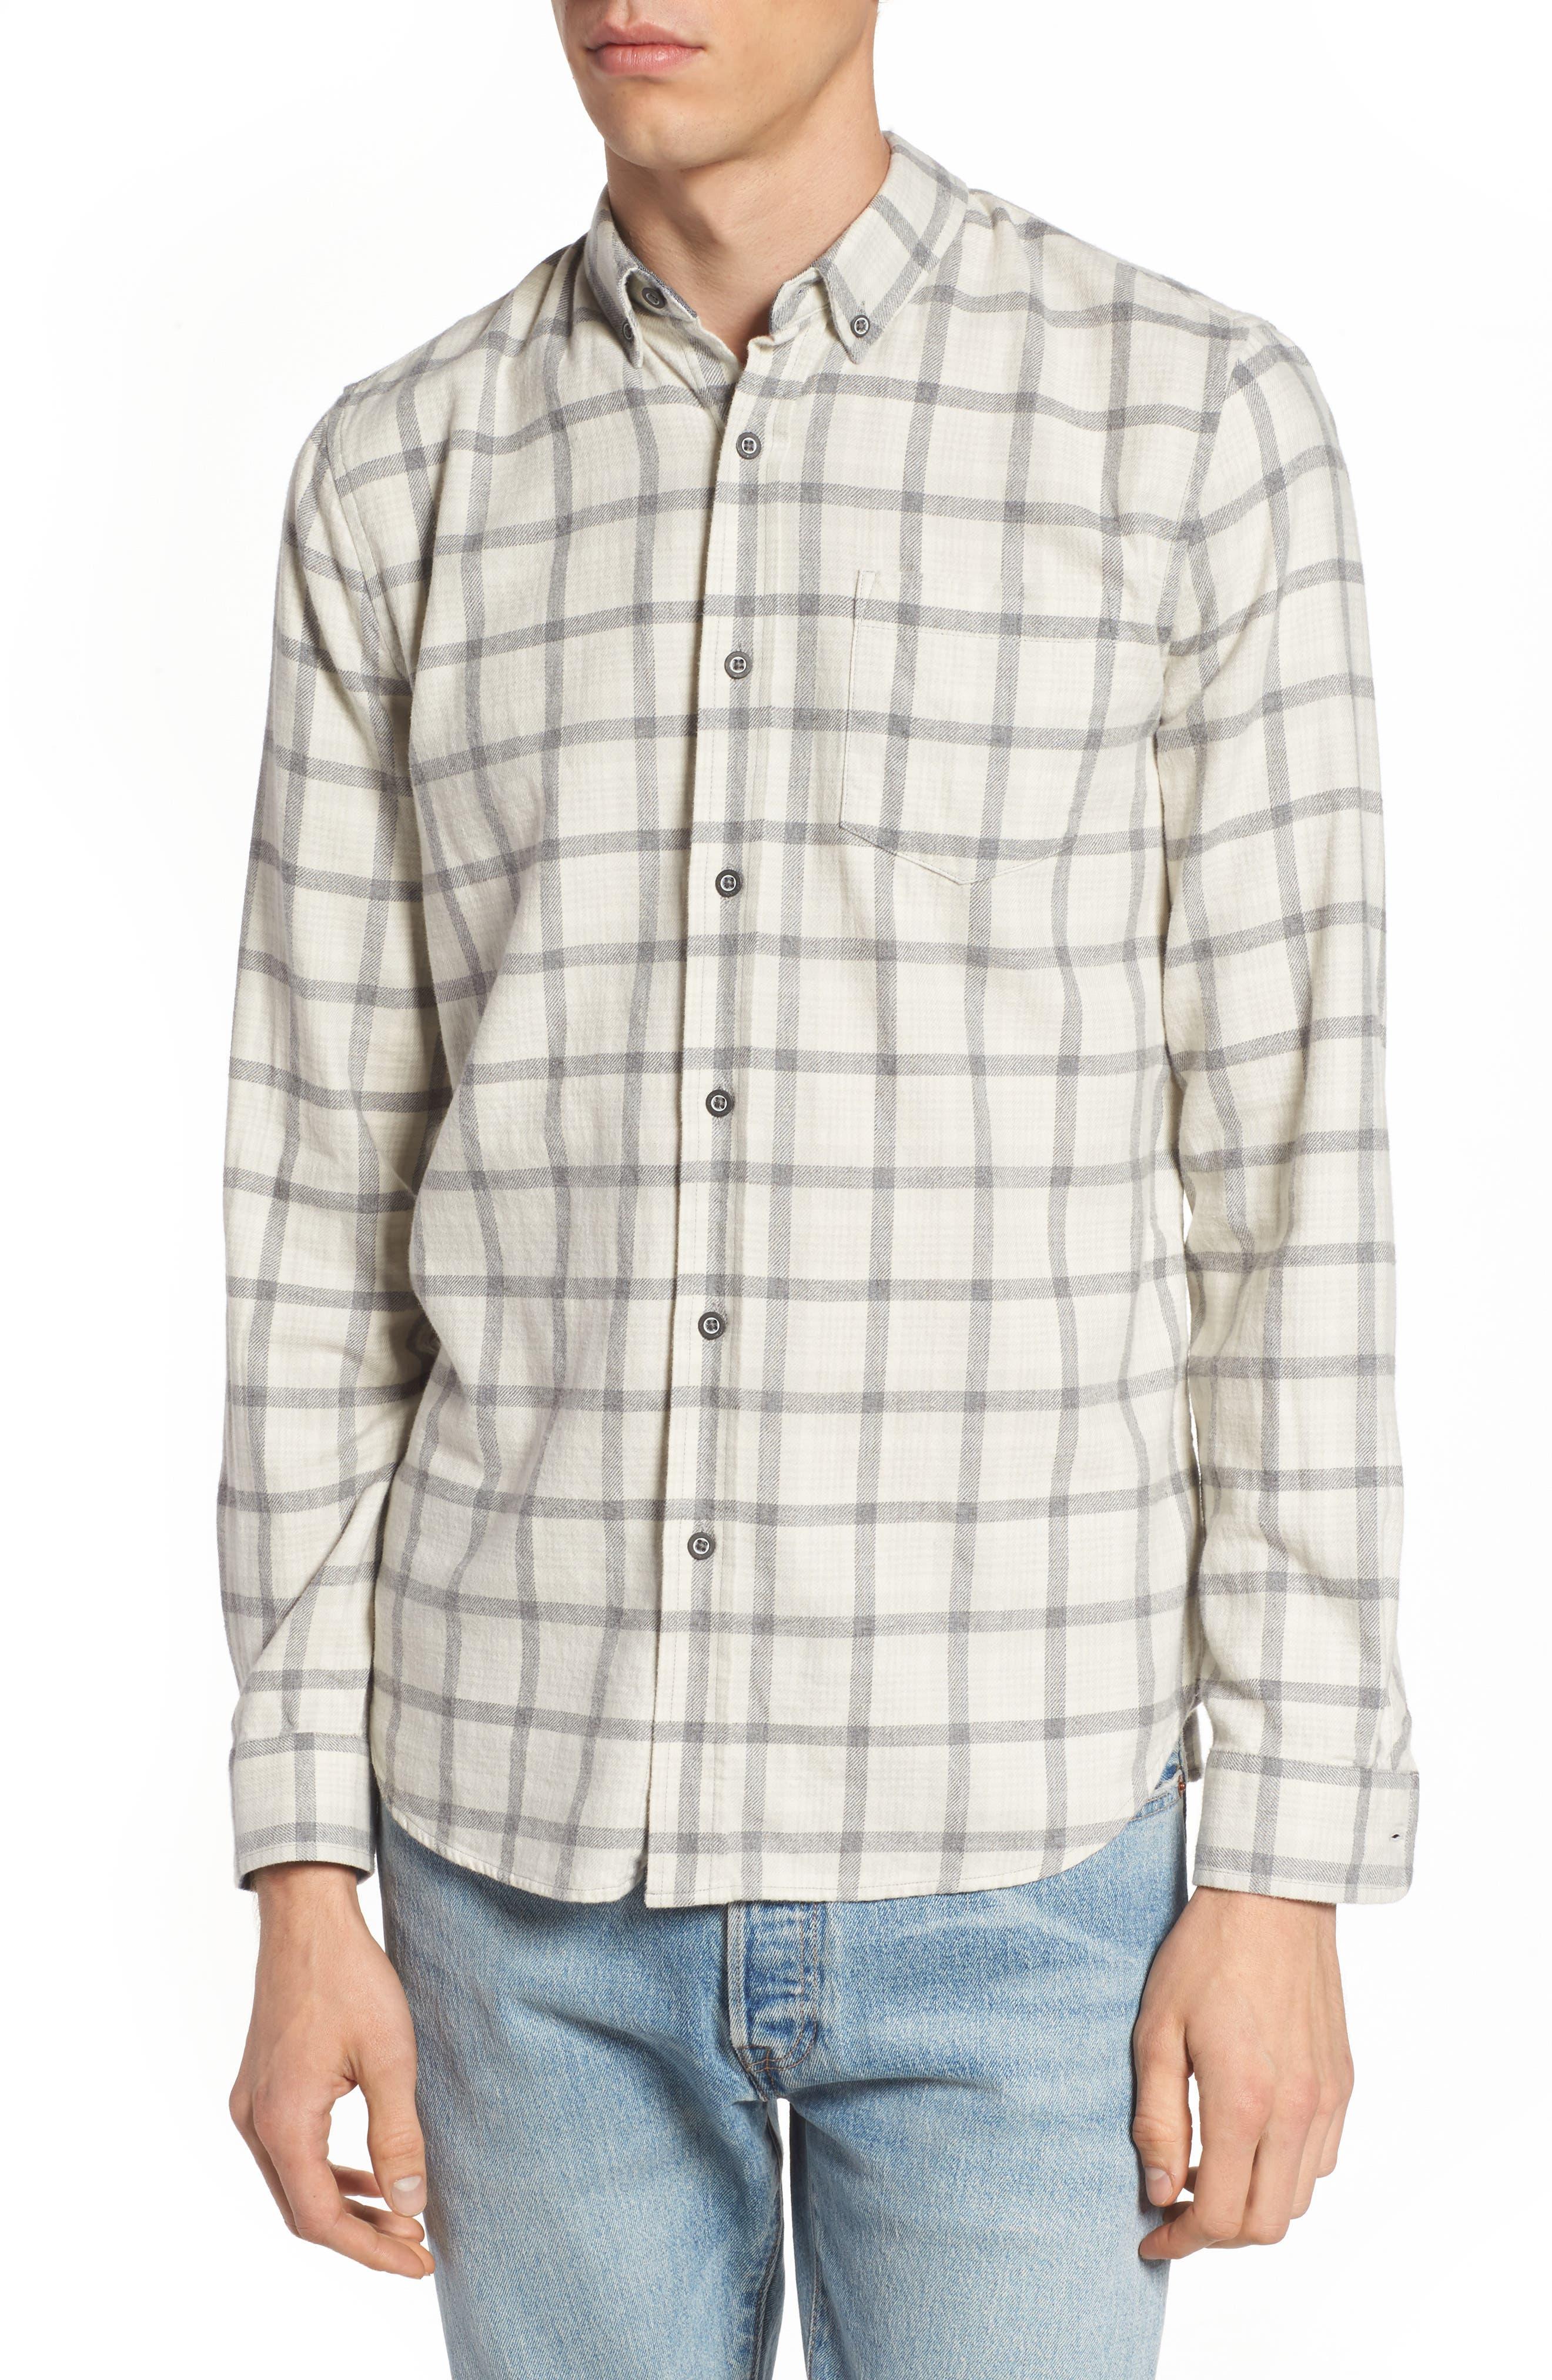 Grady Slim Fit Plaid Sport Shirt,                         Main,                         color, Moon Glade/ Heather Grey